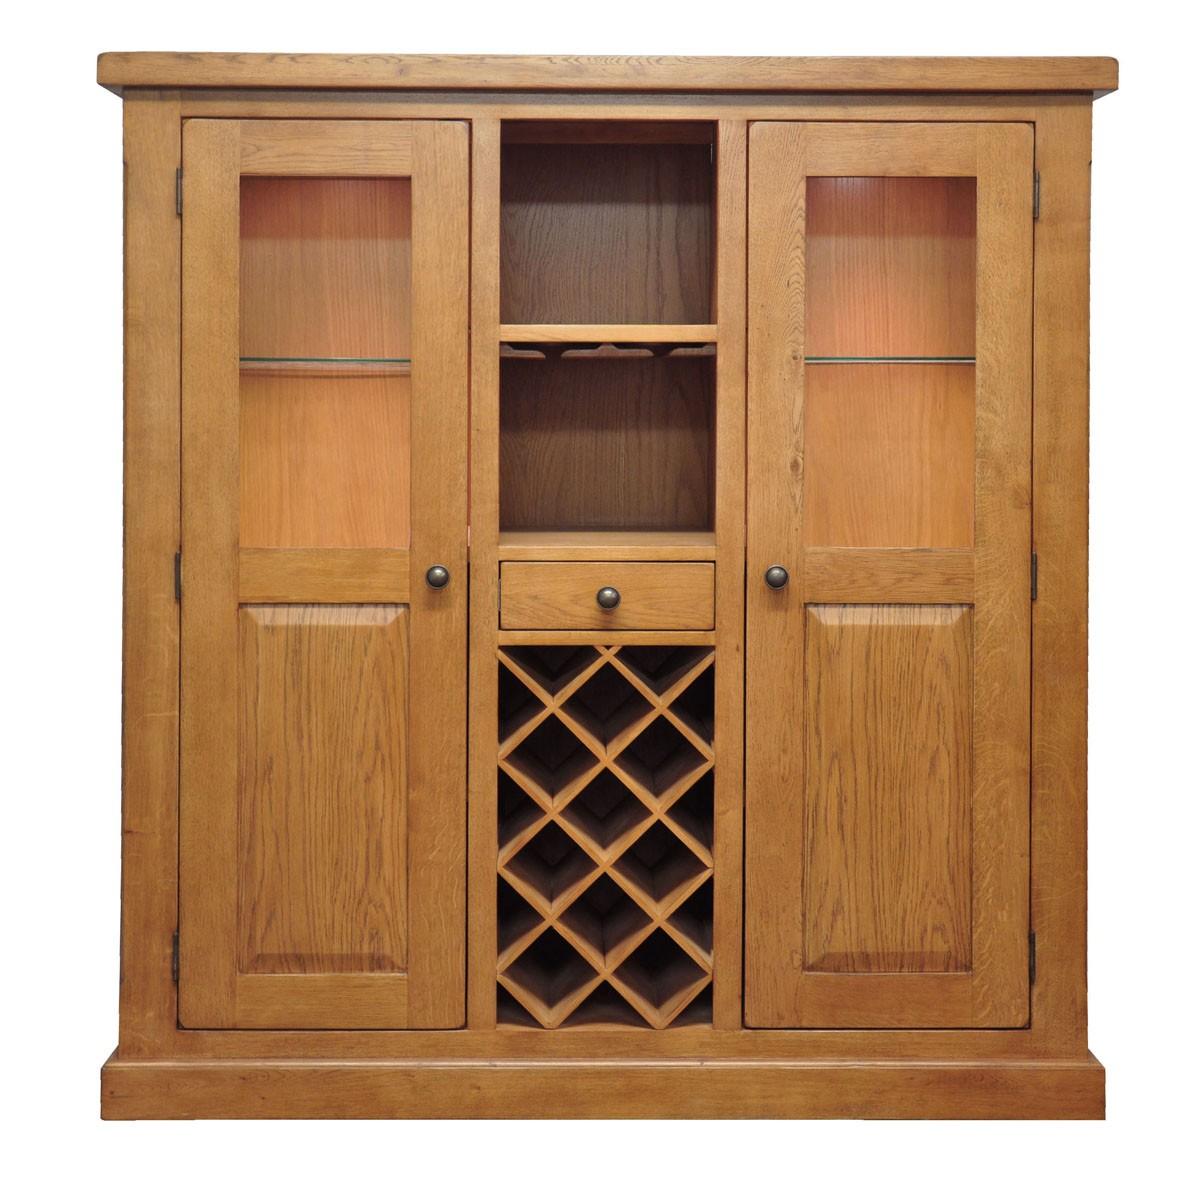 Tewkesbury Highboard Cabinet